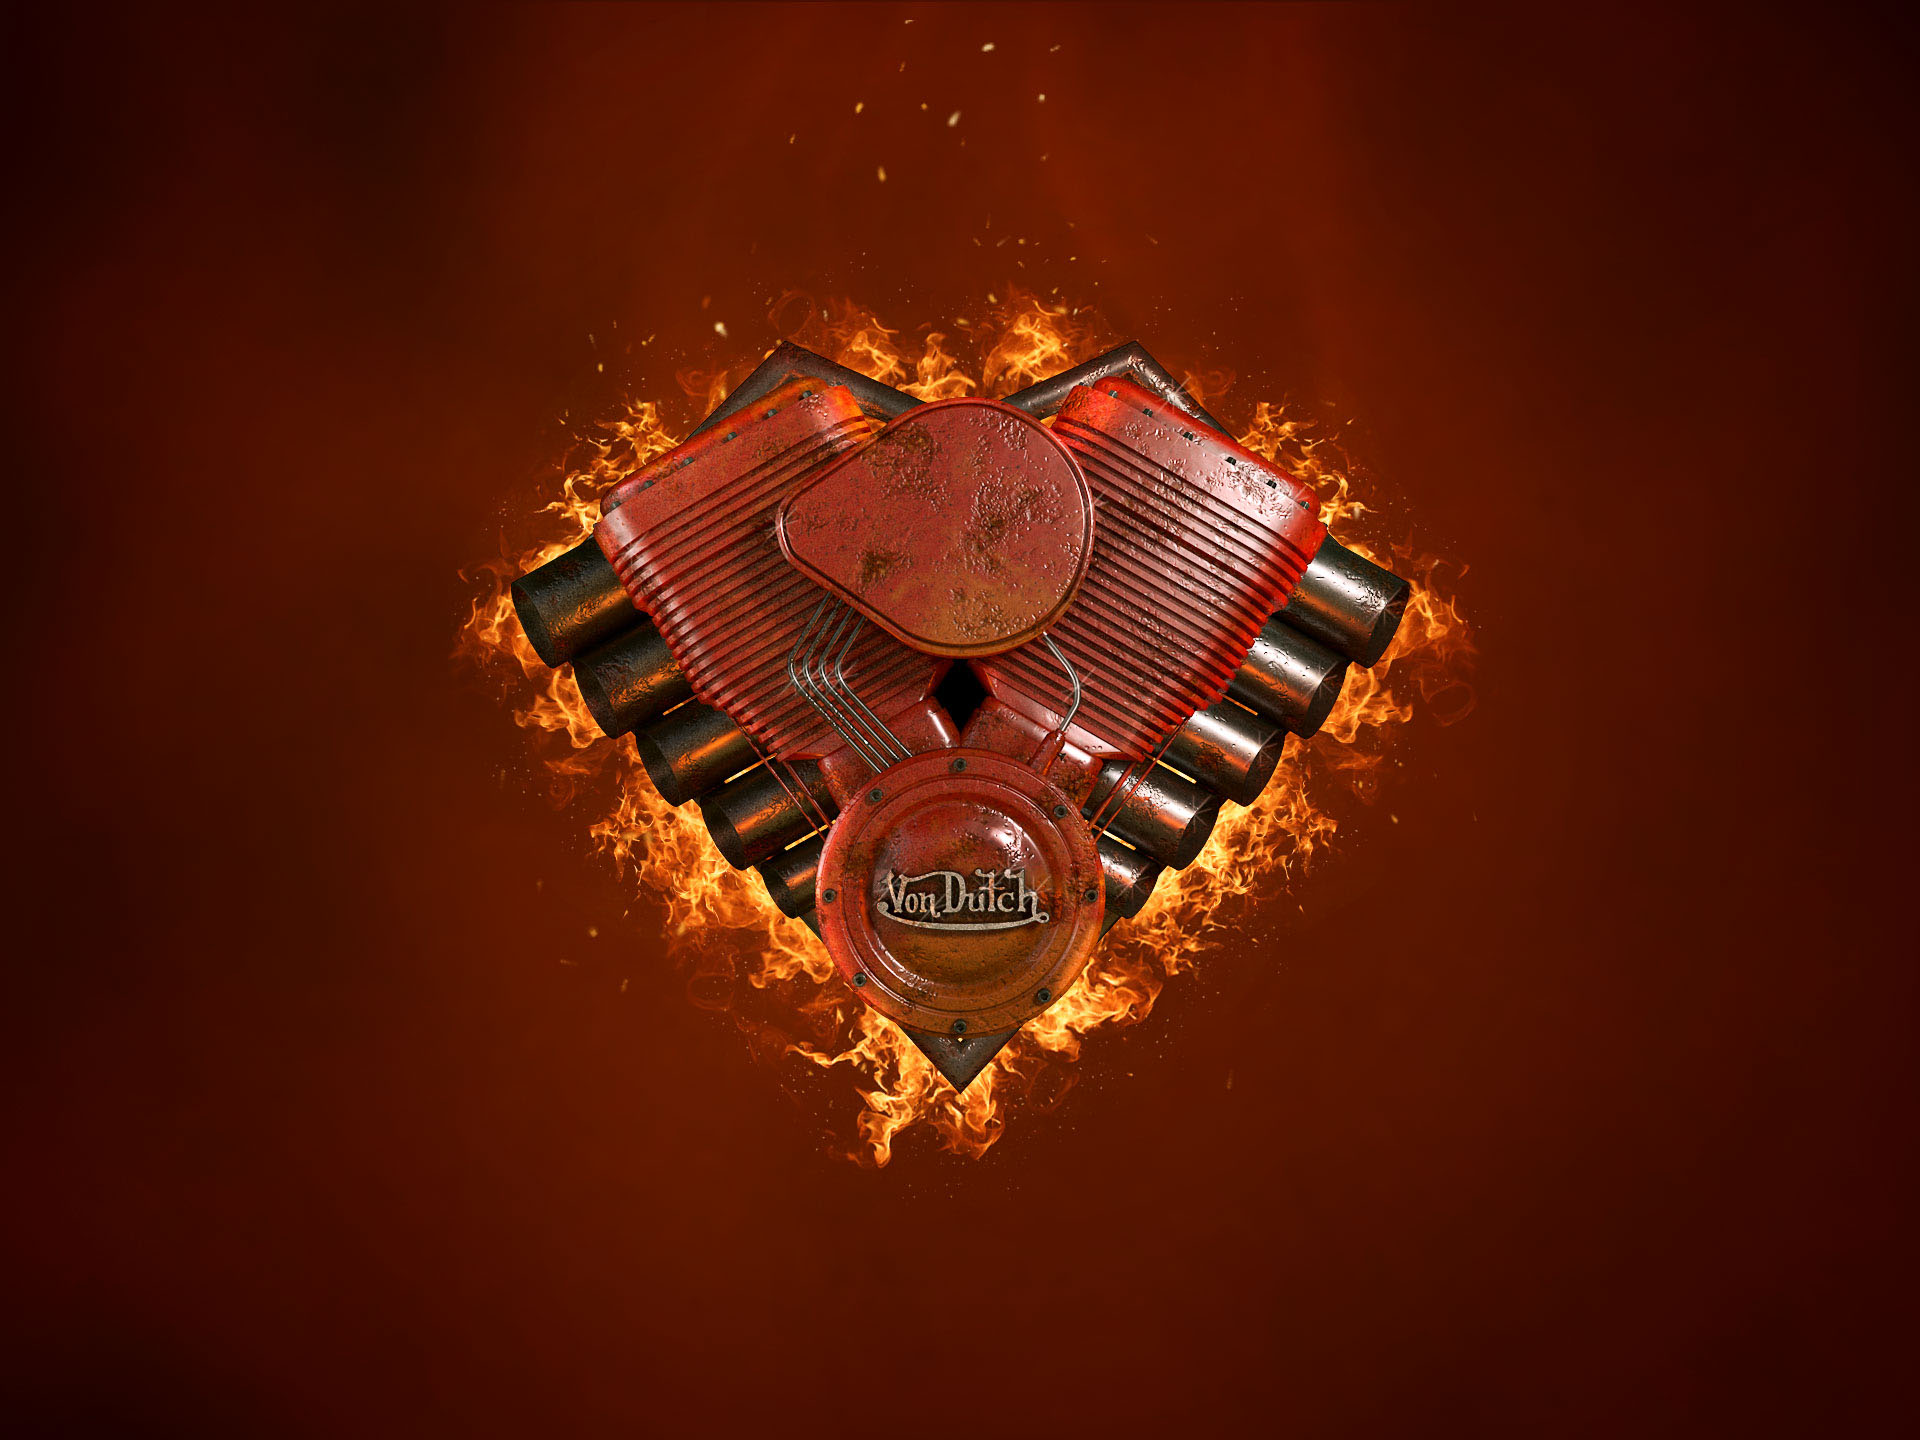 Marketing Digital: True Love - Dia dos Namorados | Cliente: Von Dutch Brasil